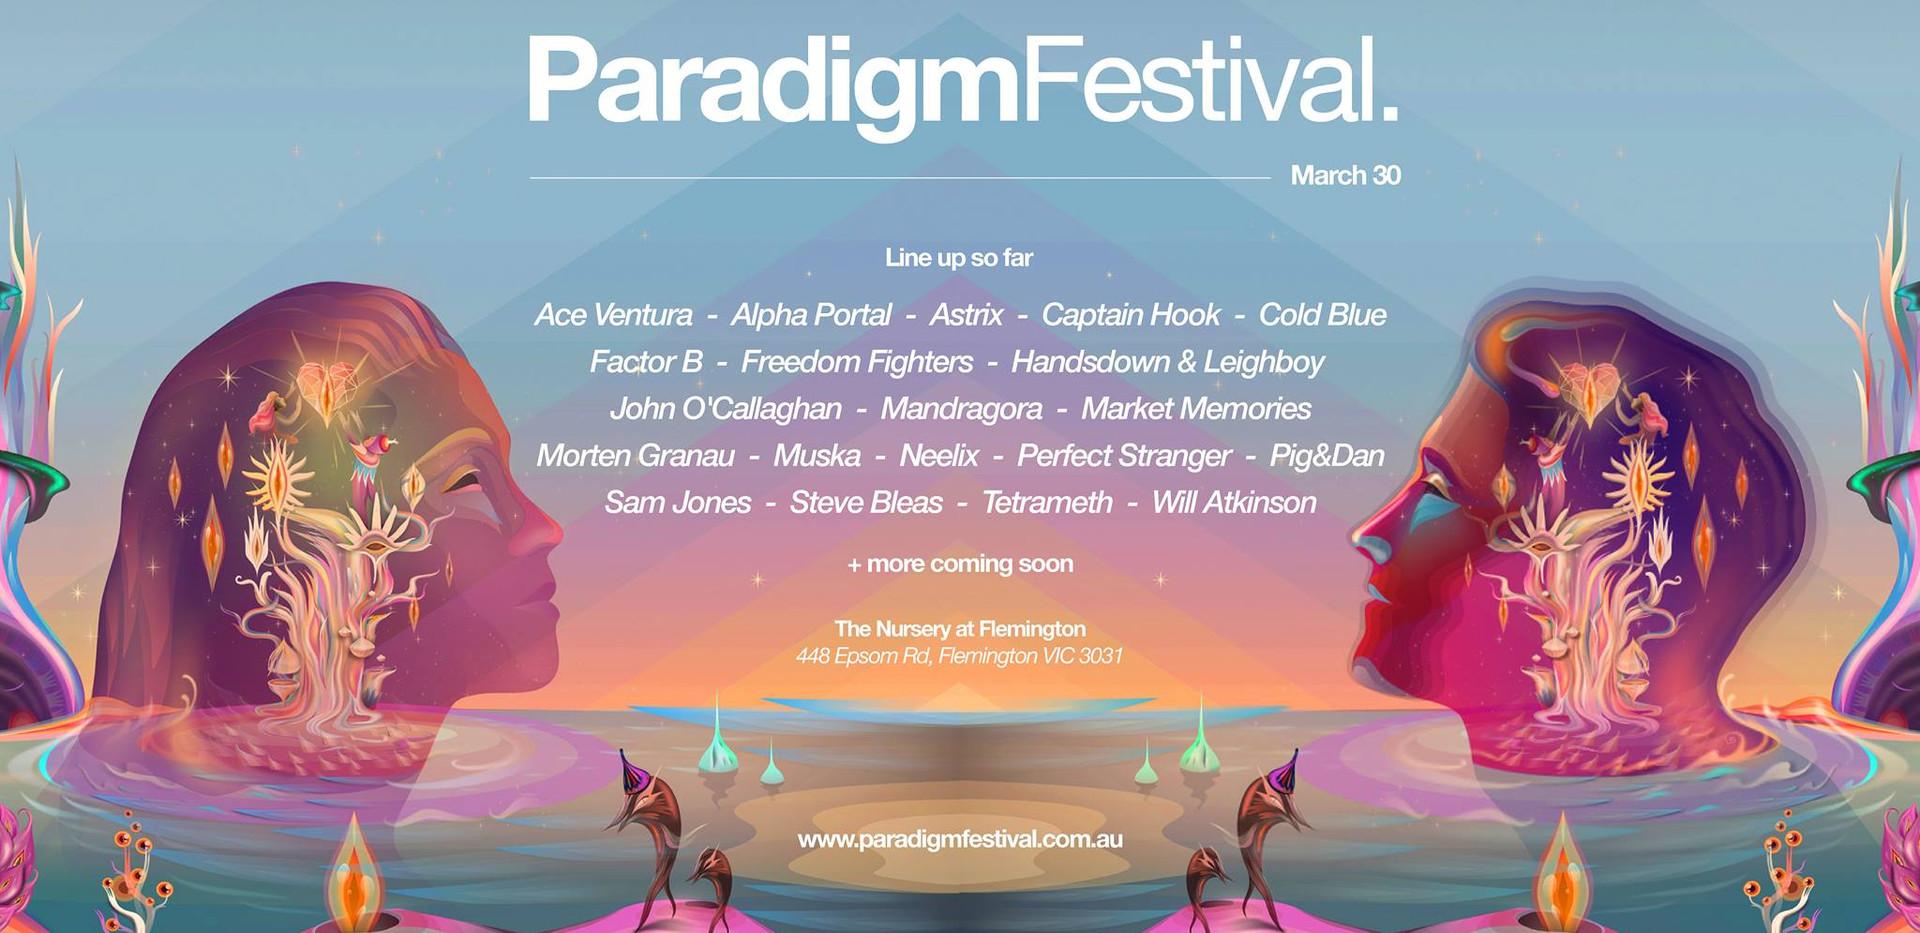 24 - Paradigm 2019 Electric Parade.jpg